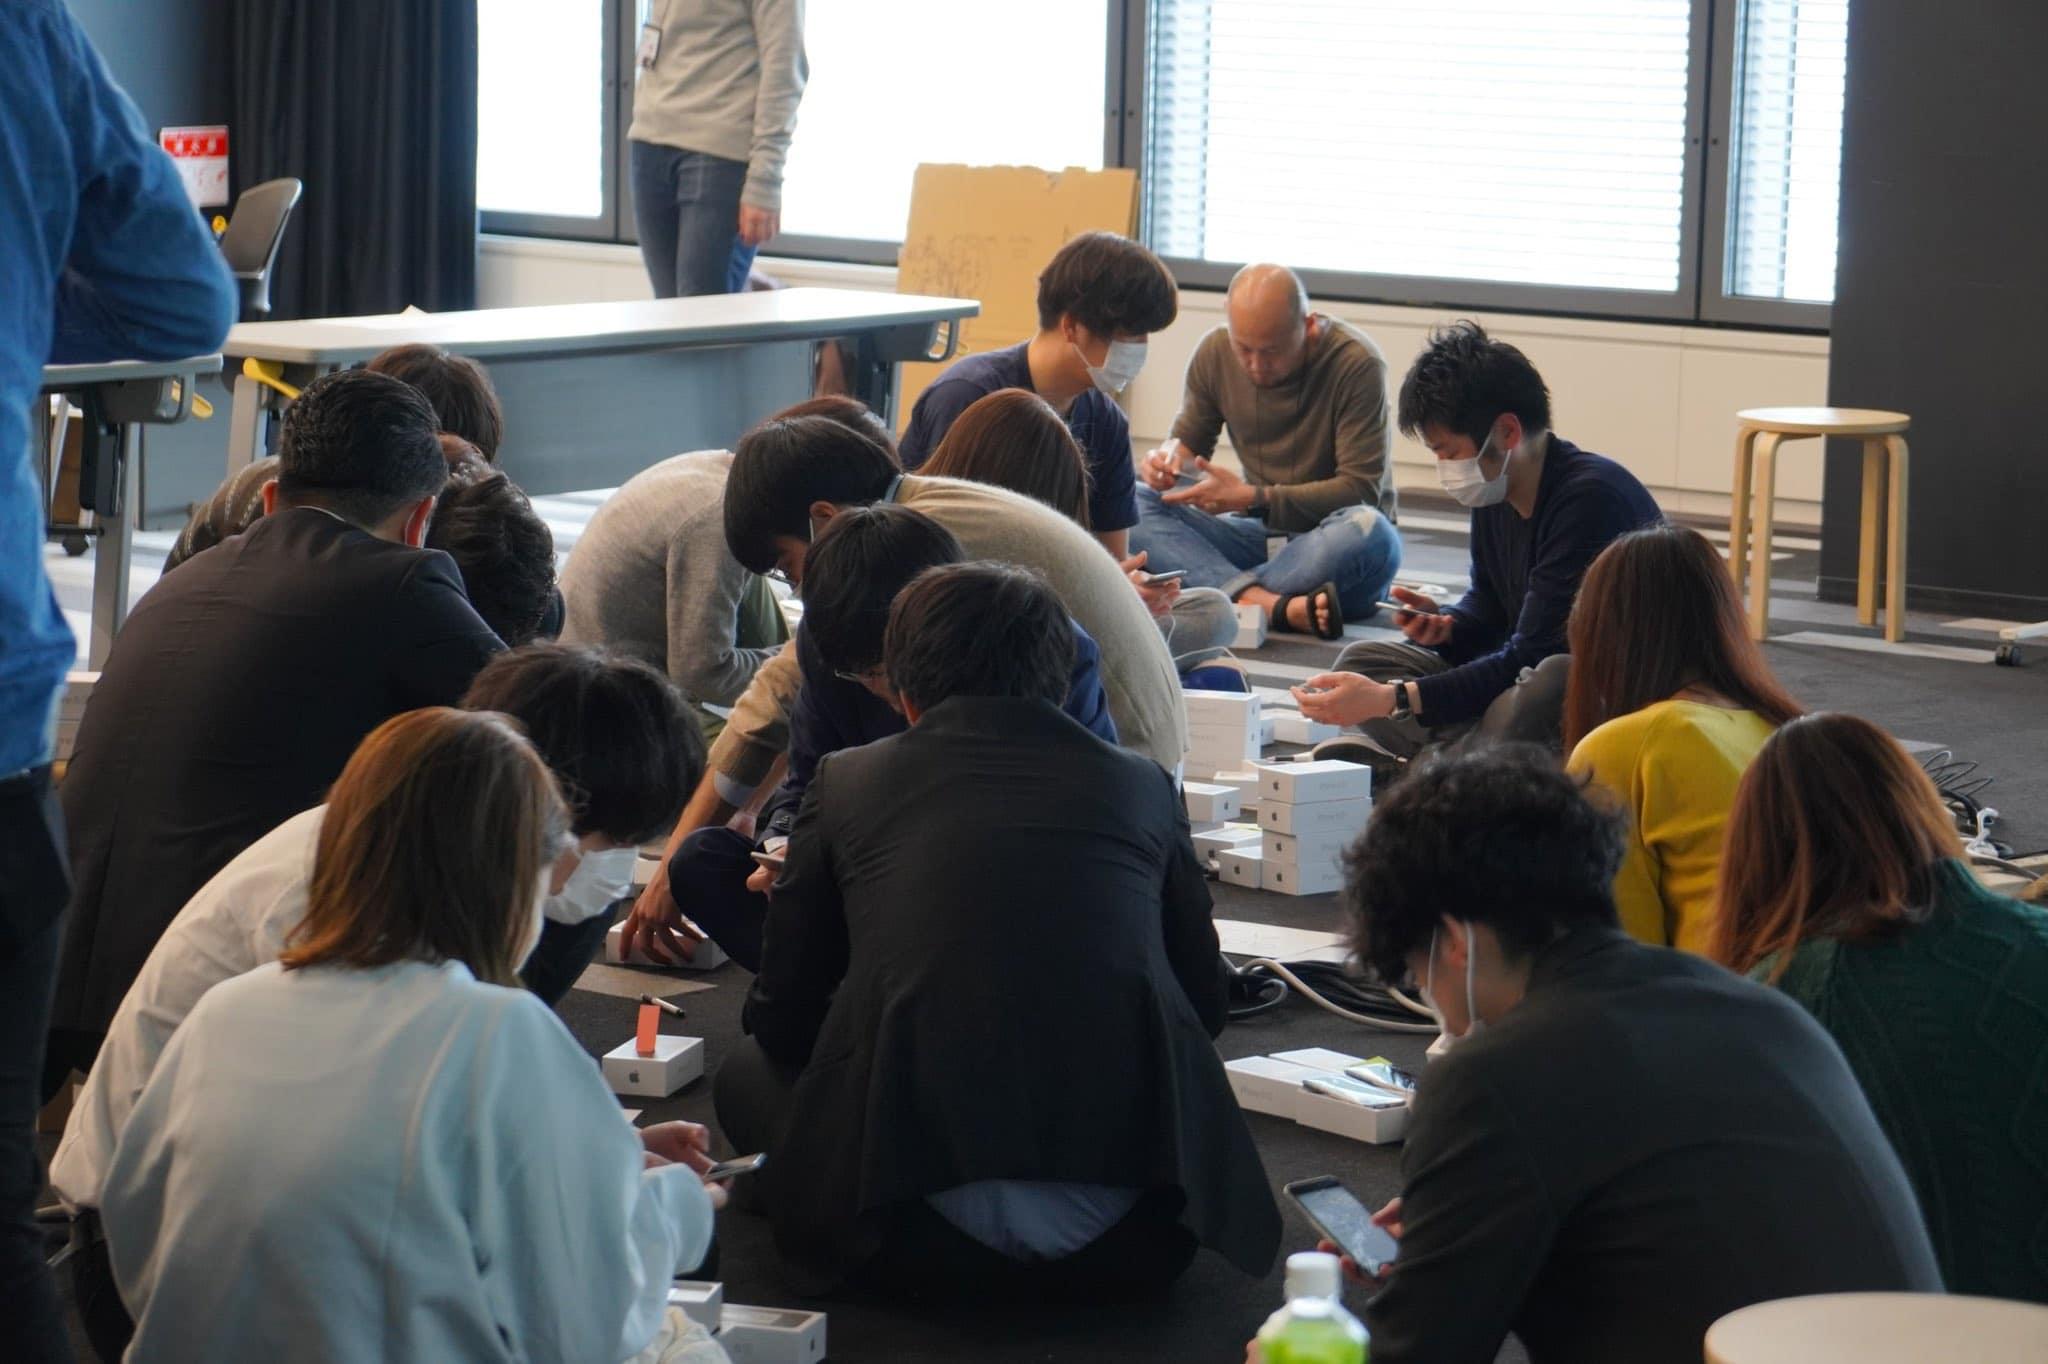 Coronavirus: Japan distributes 2,000 iPhones to quarantined cruise passengers